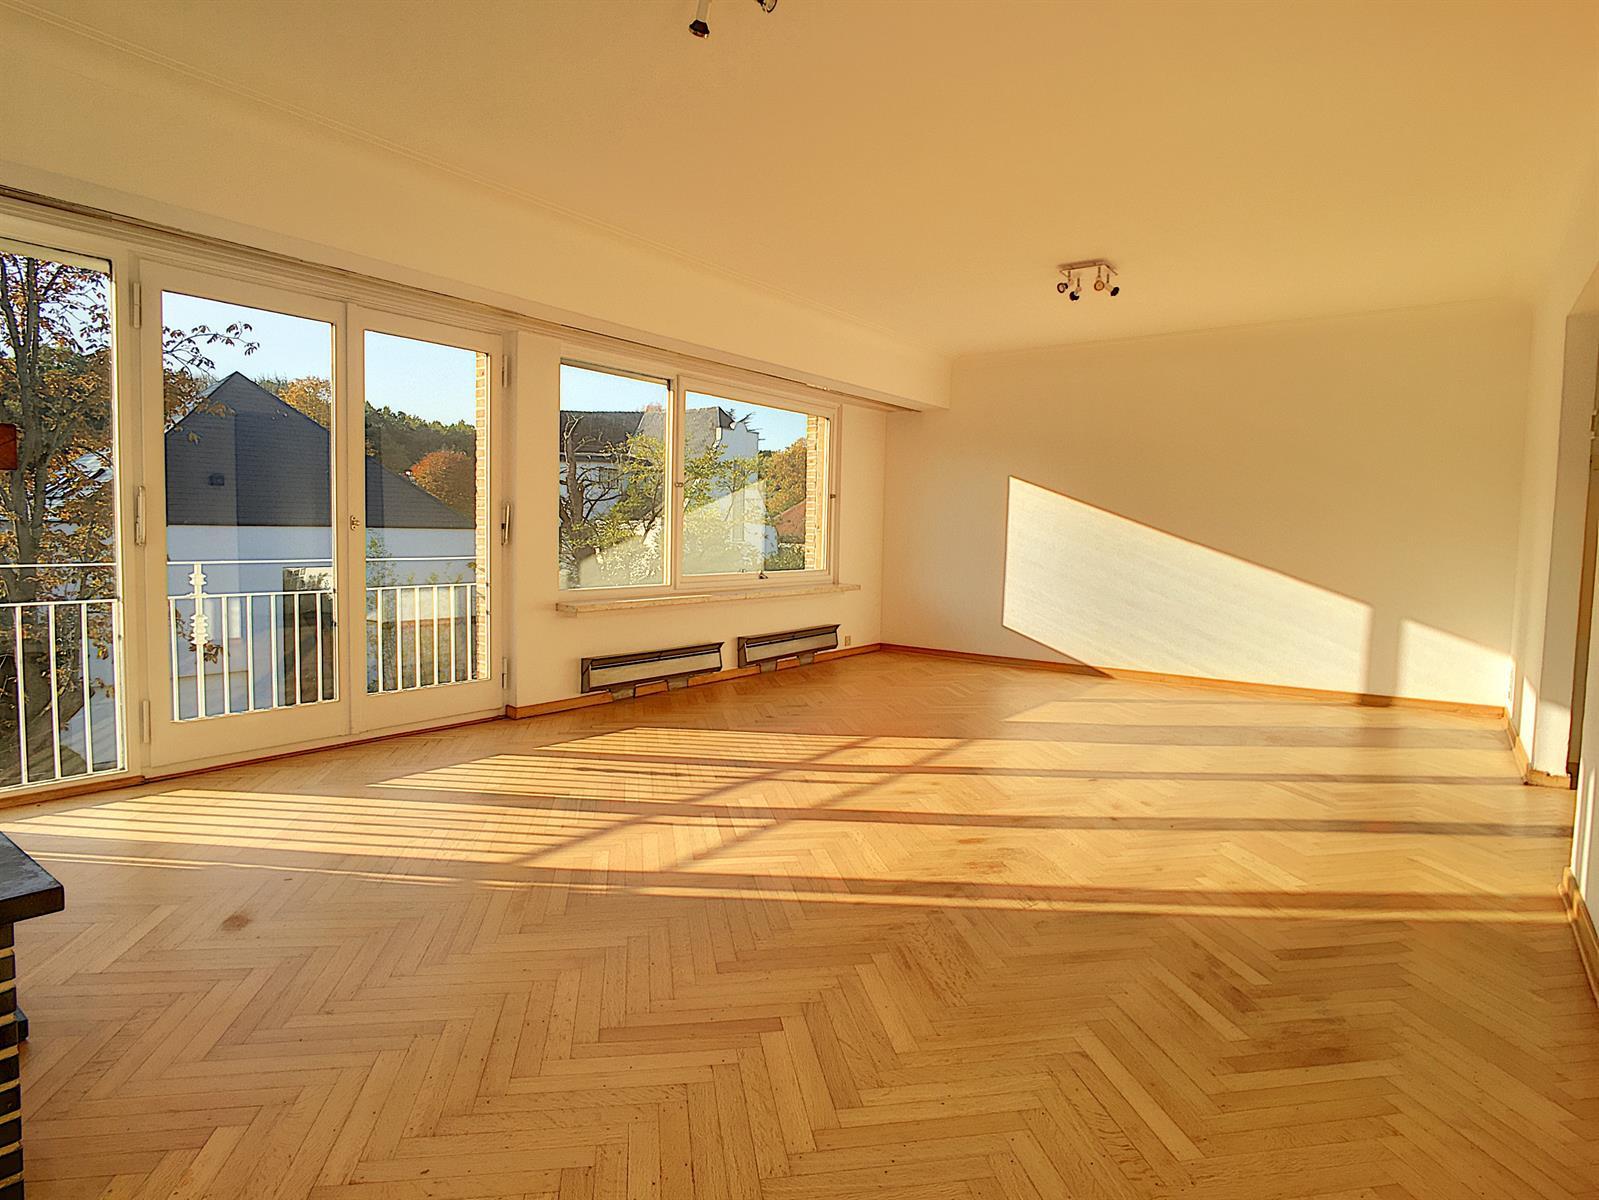 Flat - Auderghem - #4197560-2